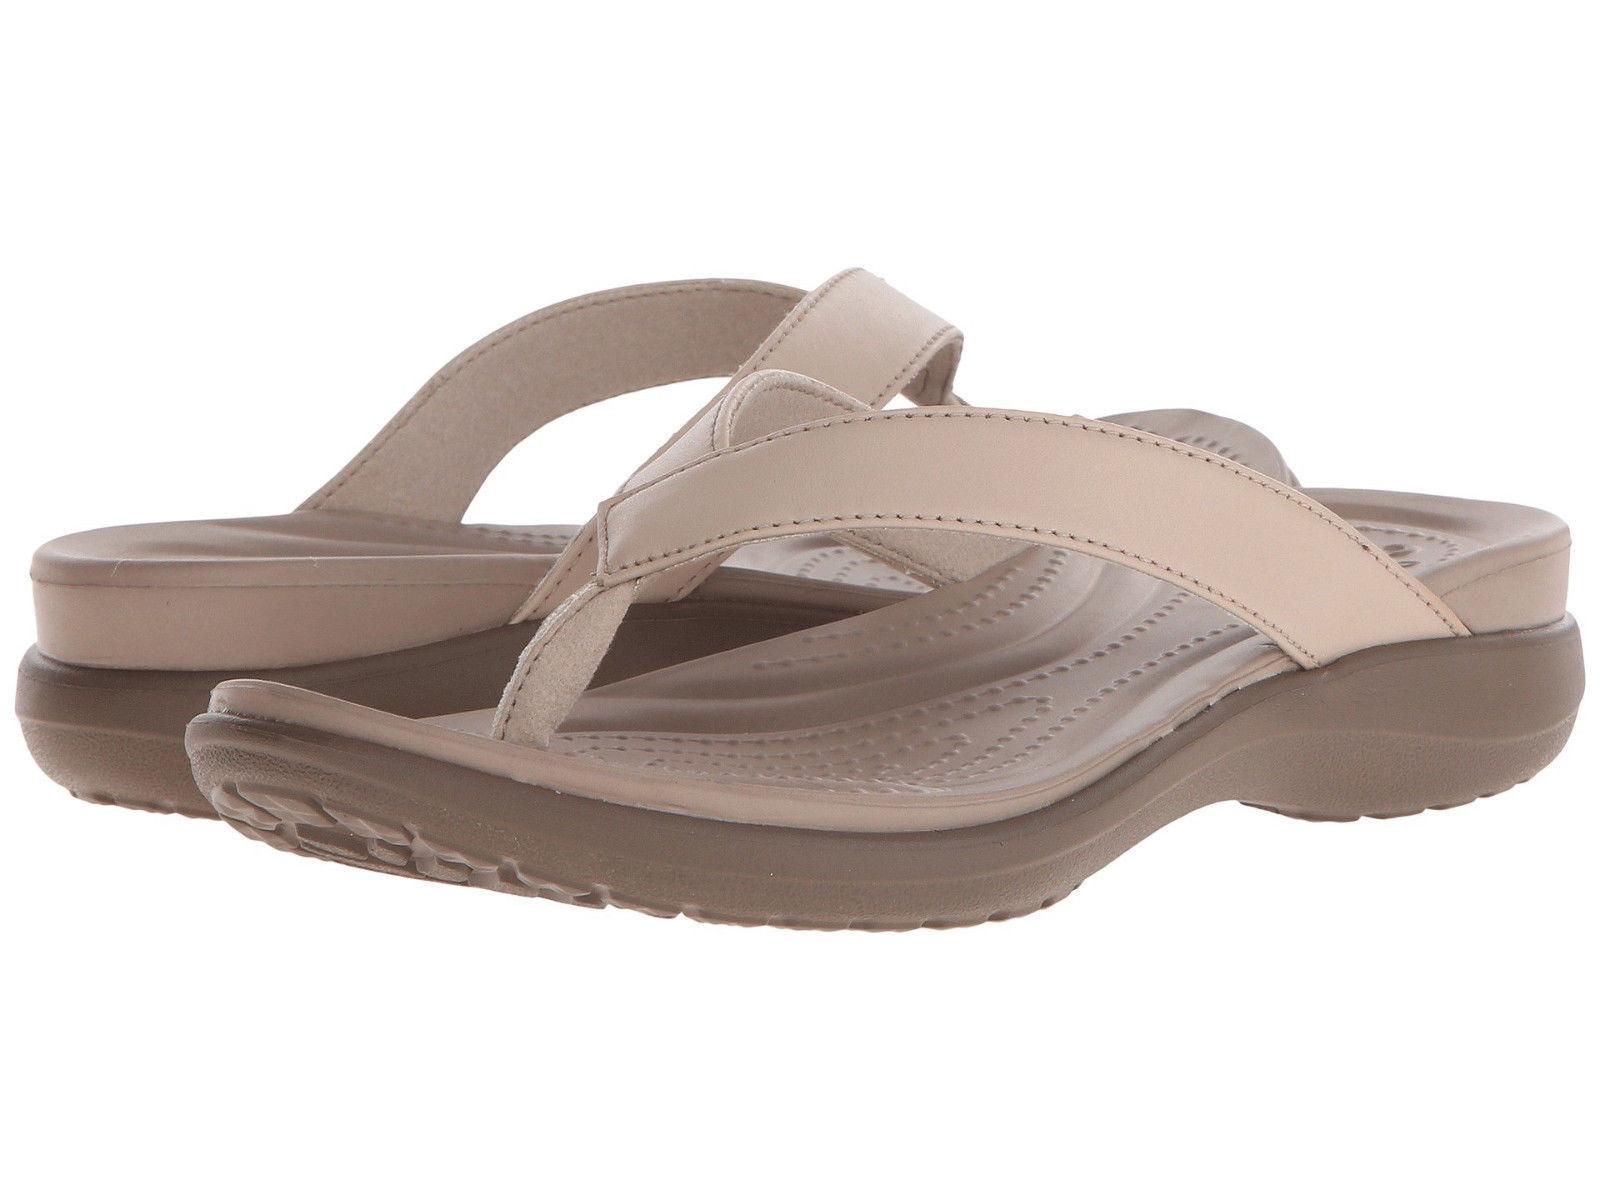 Women Crocs Capri V Flip Flop Sandal 202502-27L Chai Walnut 100% Authentic New